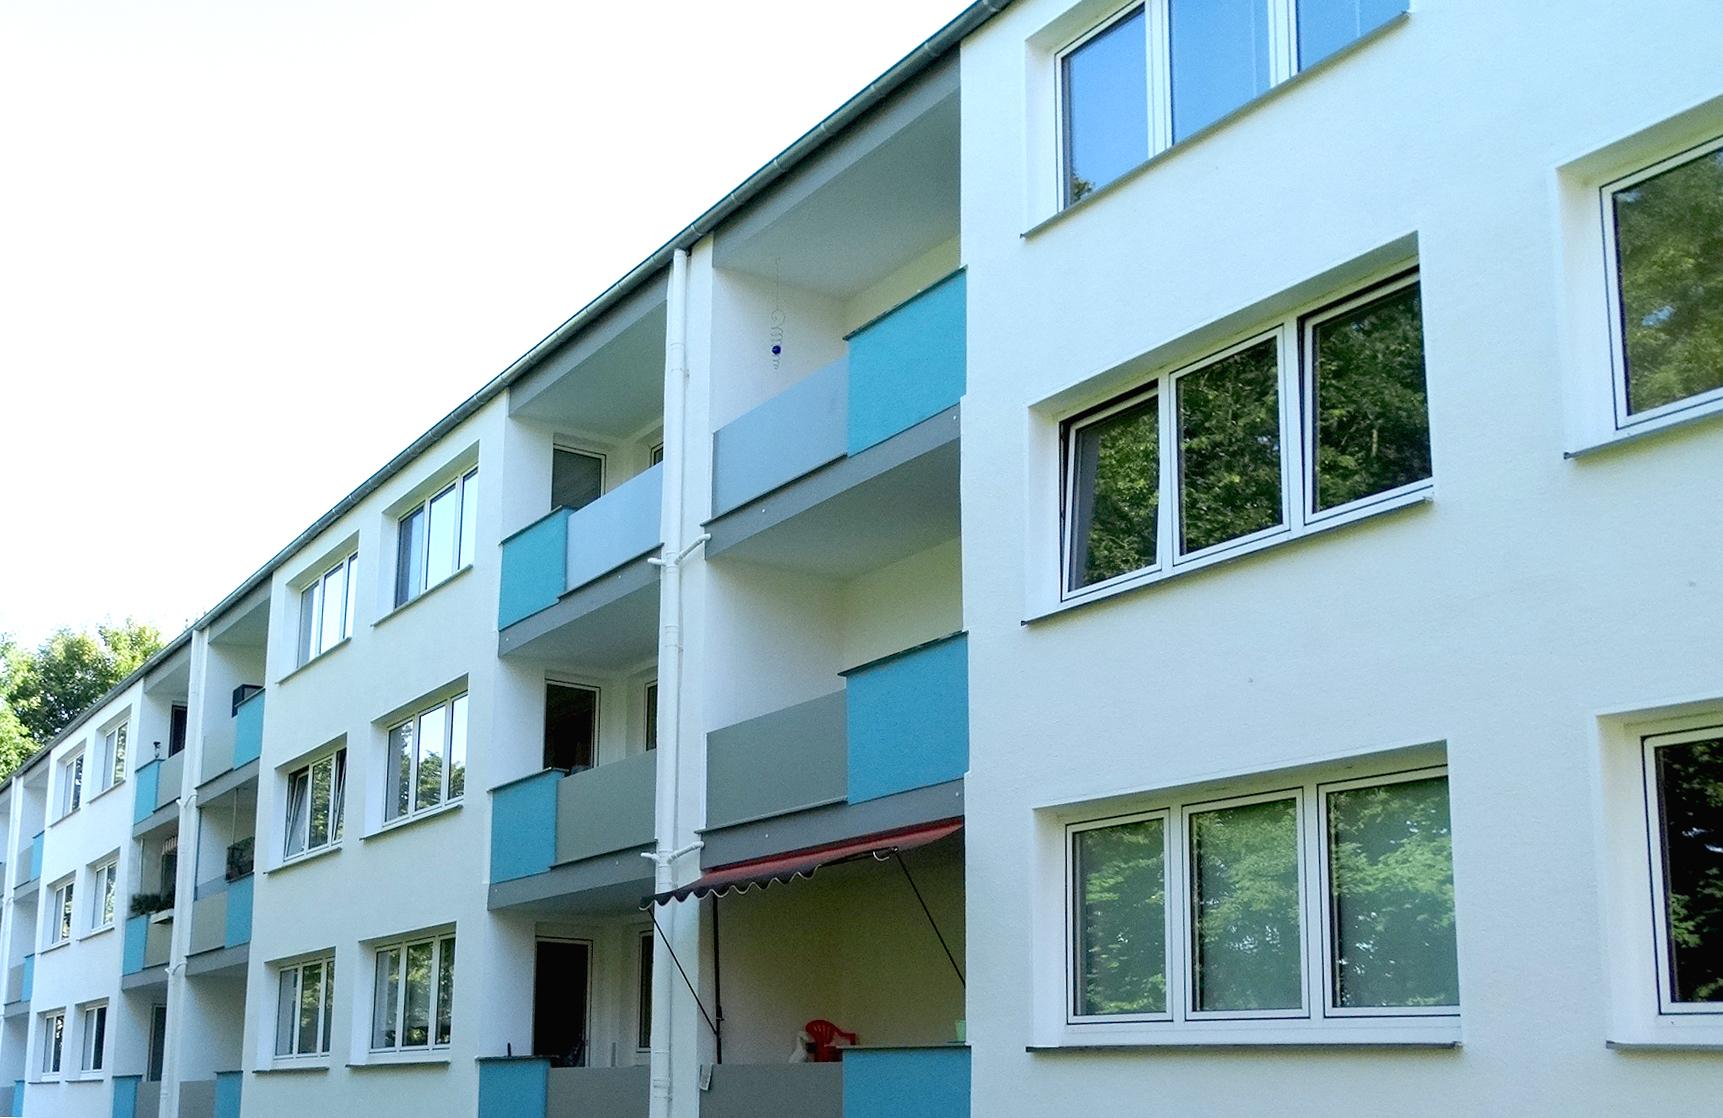 frische farbe f r fassade in recklinghausen grand city property gcp wohnungssuche. Black Bedroom Furniture Sets. Home Design Ideas